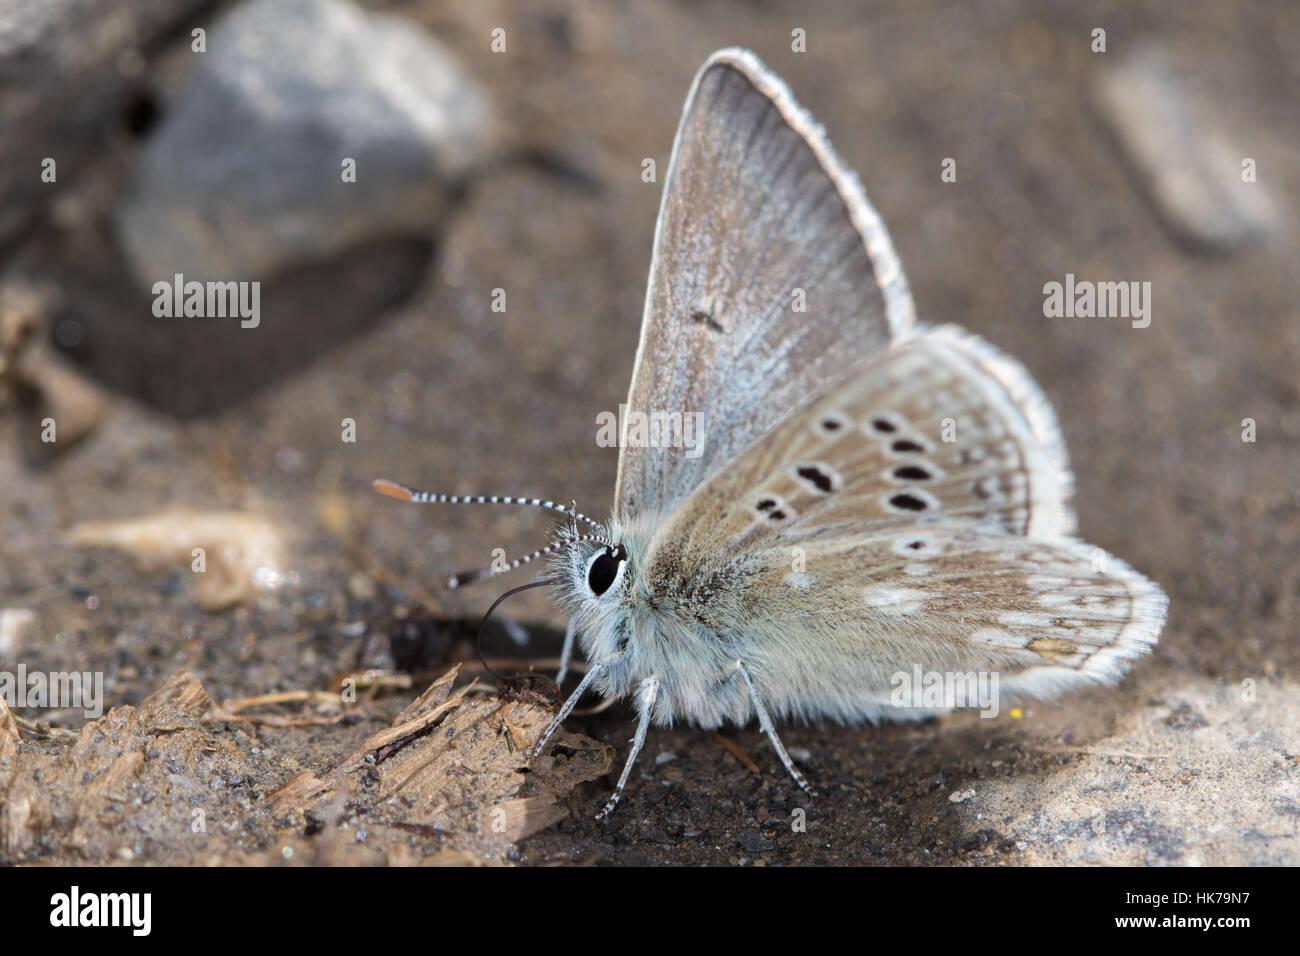 Glandon Blue (Plebejus glandon) butterfly feeding on minerals from damp soil - Stock Image